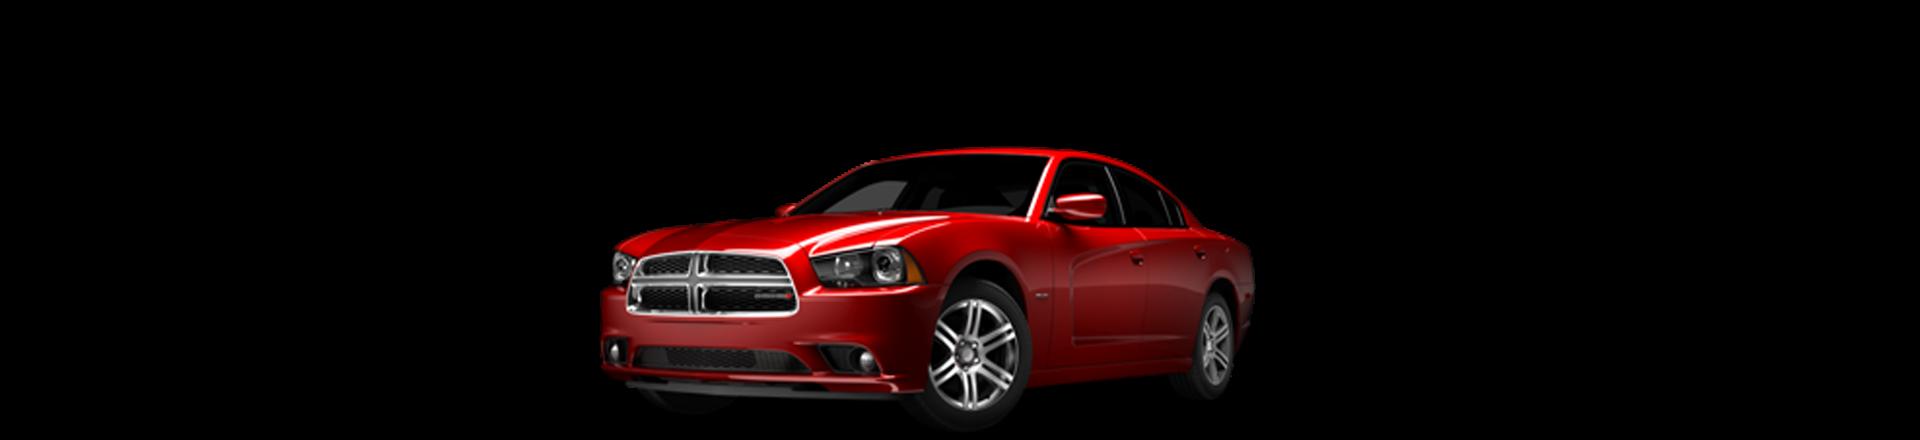 richard bell auto sales used cars deland fl used cars html autos weblog. Black Bedroom Furniture Sets. Home Design Ideas